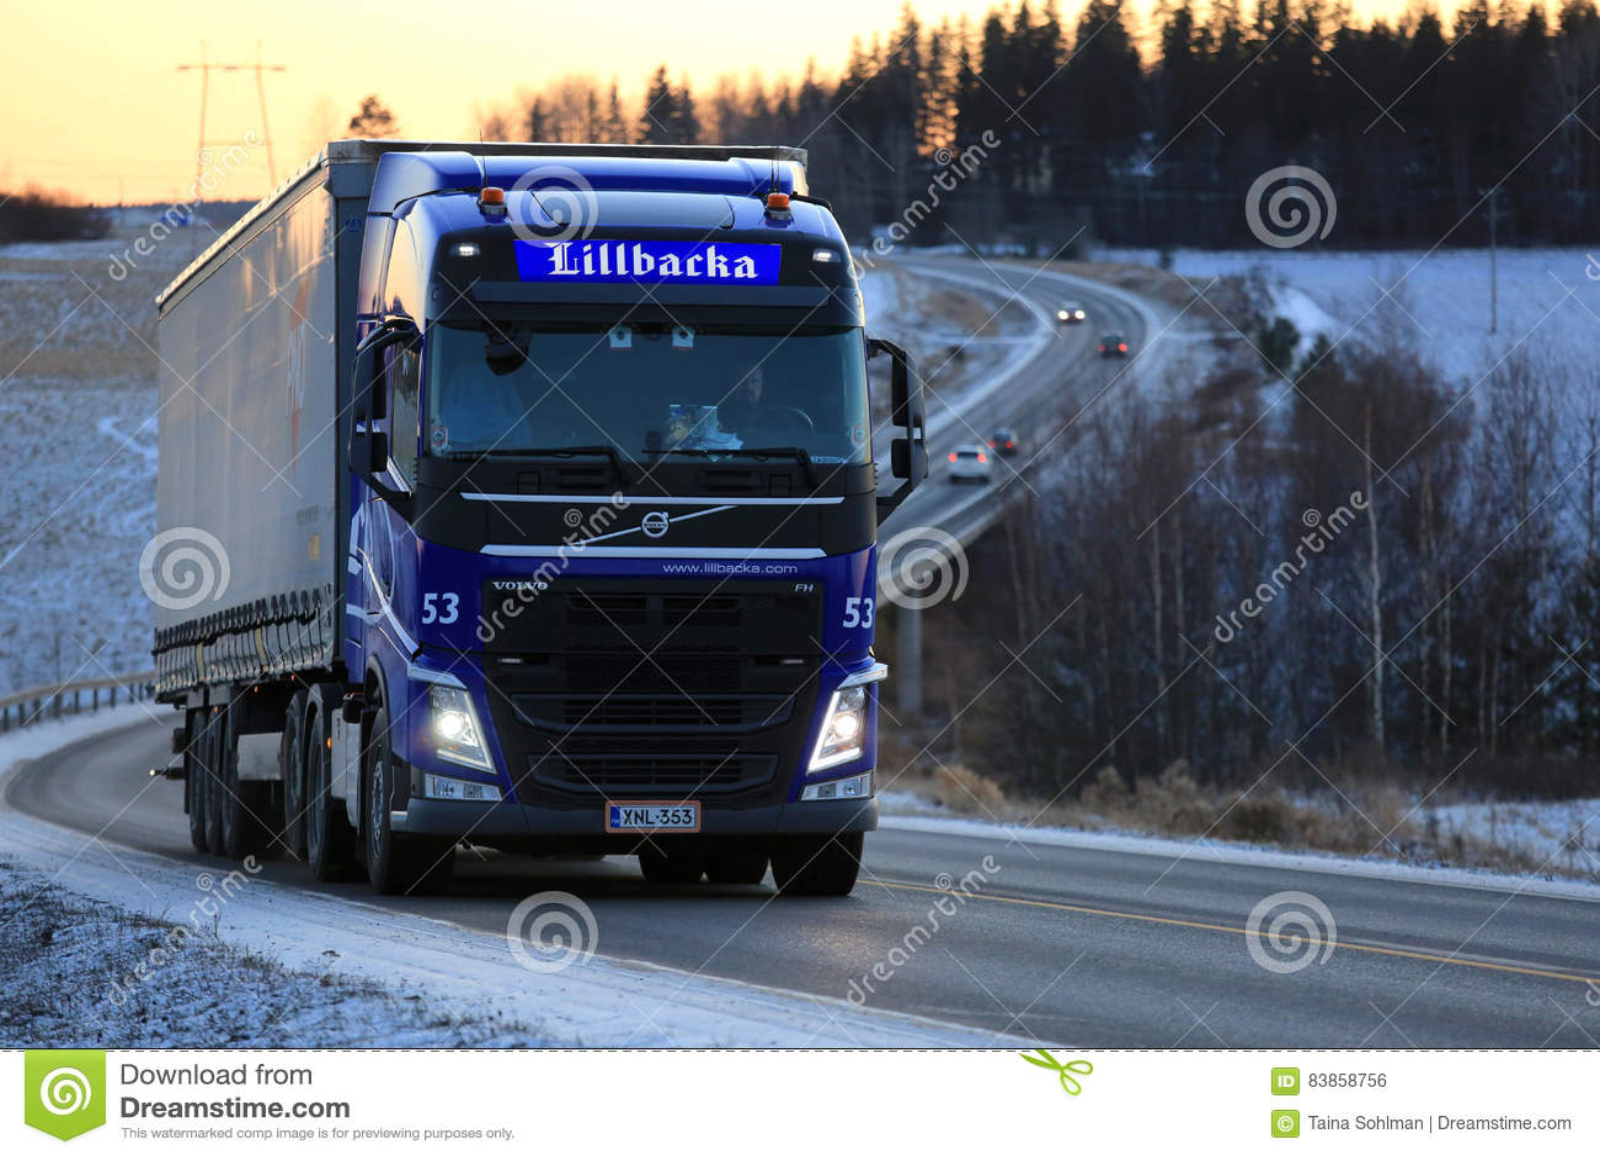 Lillbacka Logistics